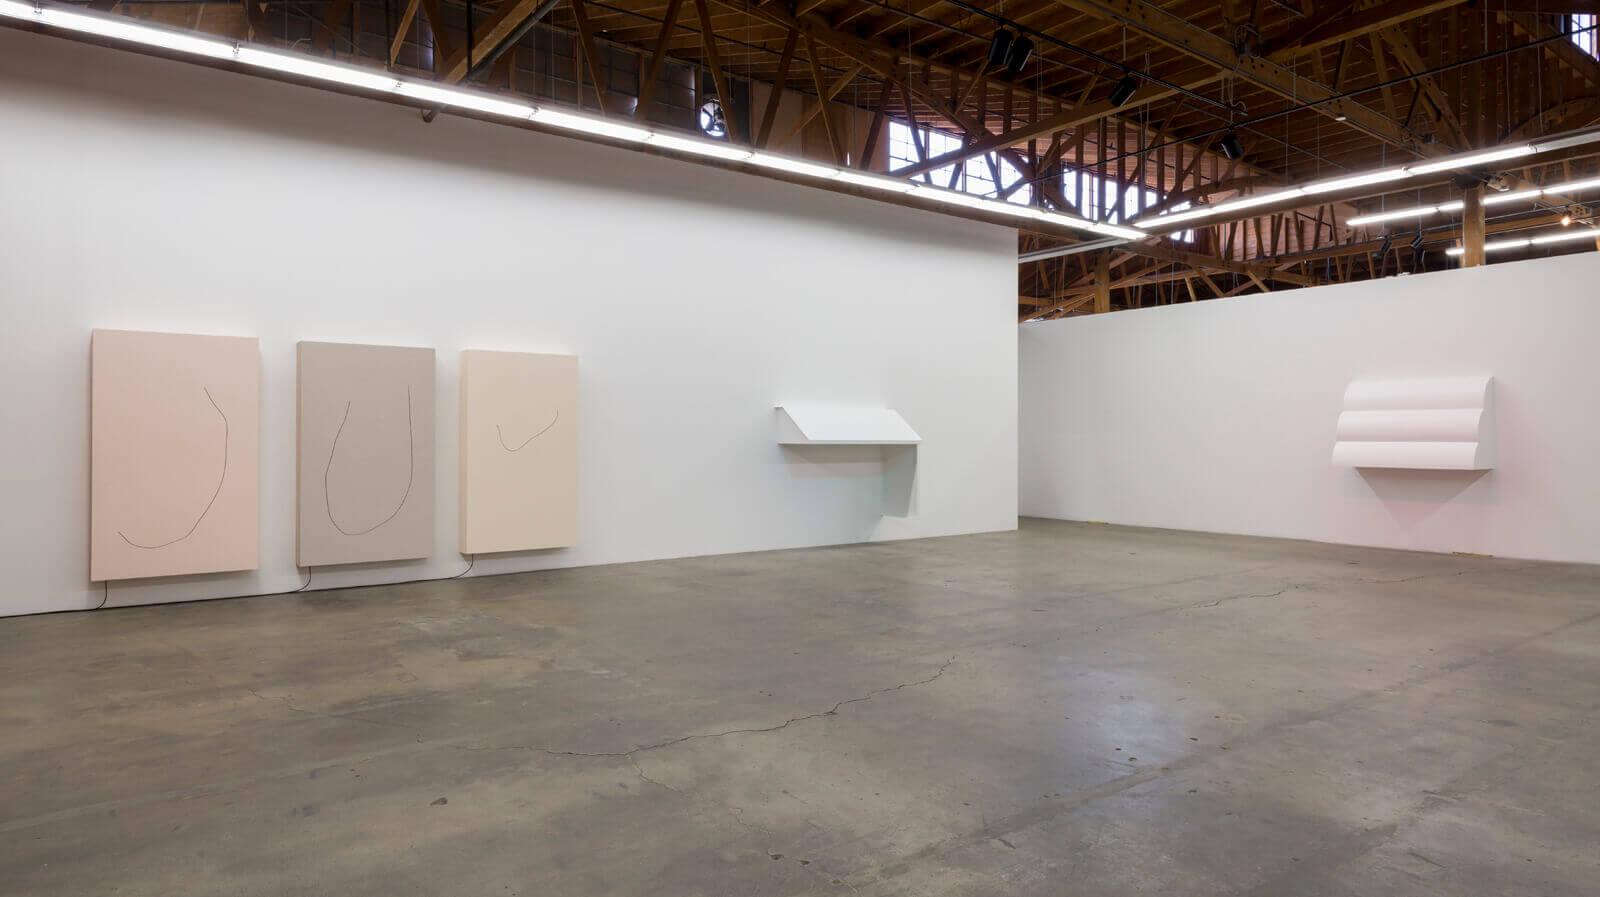 B_Davide-Balula-Broken-Things-Float-Faster-Installation-View-2016-2